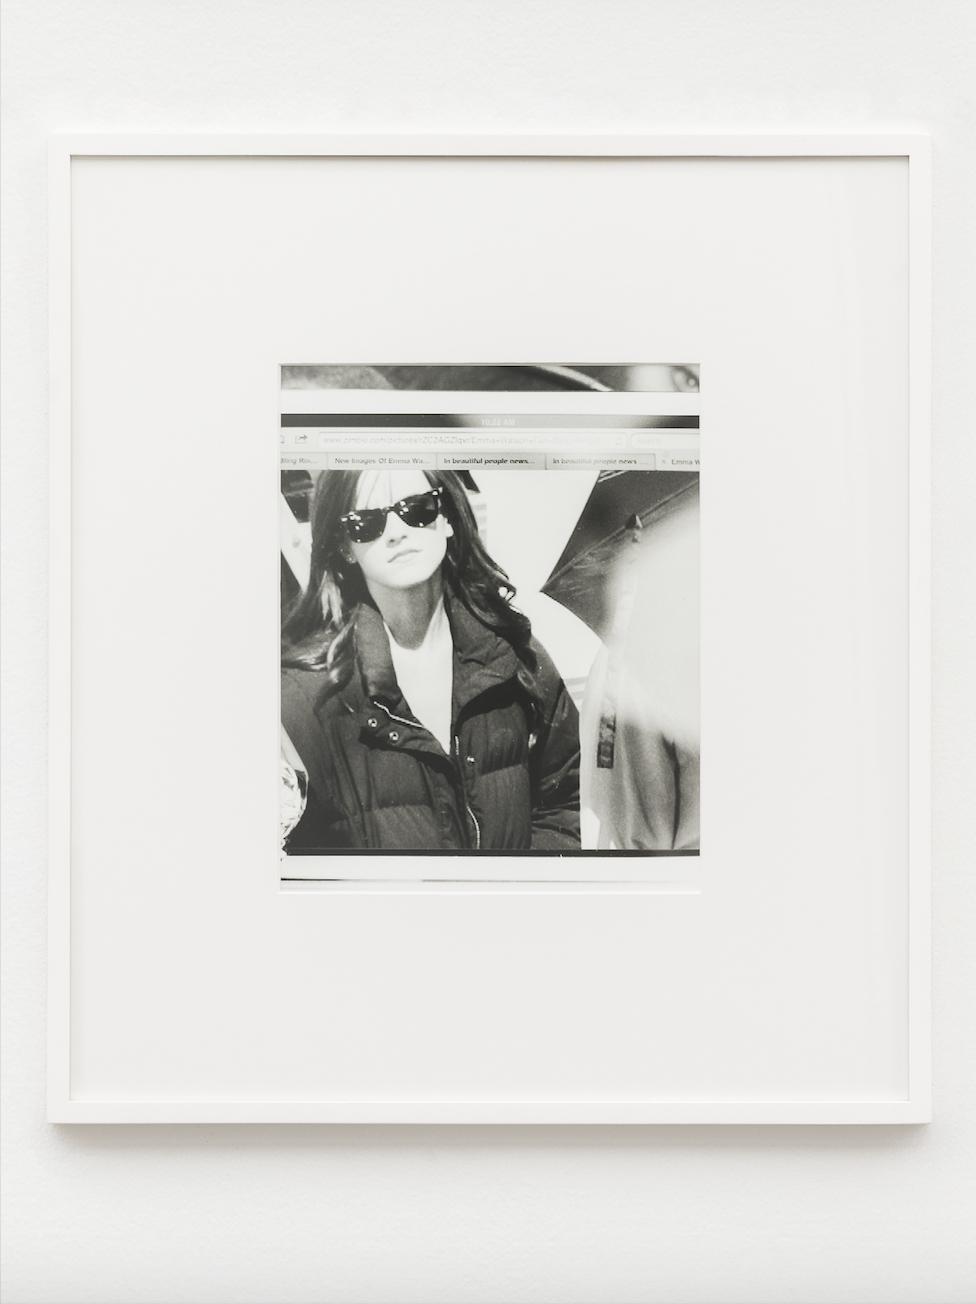 IN REAL LIFE curated by_Luca Lo Pinto, TOBIAS KASPAR, TBR (fig.10) Emma Watson, 2013, Silbergelantine-Abzug, matt, 65 x 58 cm, Photo: GChristine König Galerie, Vienna, 2014, Courtesy: Tobias Kaspar und Christine König Galerie